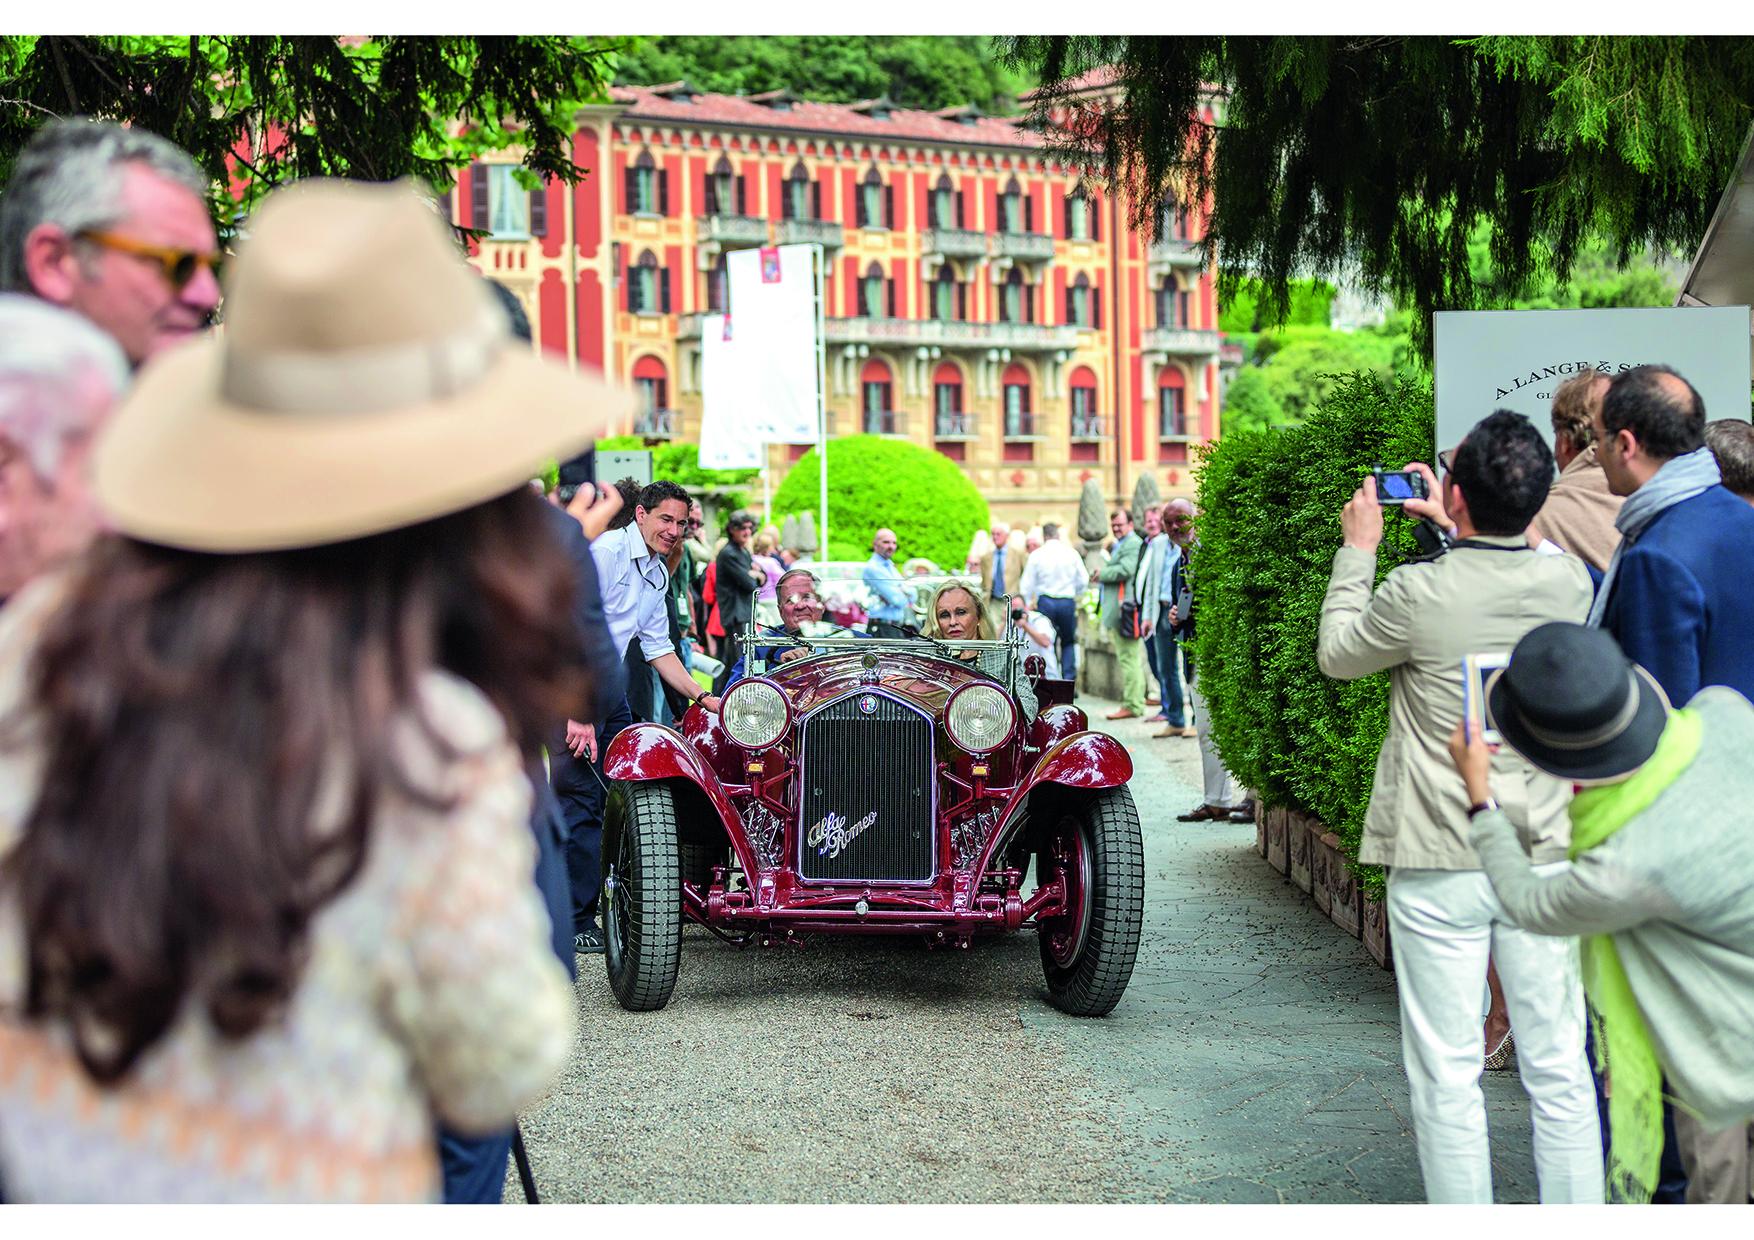 Concorso d'Eleganza Villa d'Este 2015 - A.Lange & Söhne - Ben Gierig - Fotografie www.Ben-Gierig.de